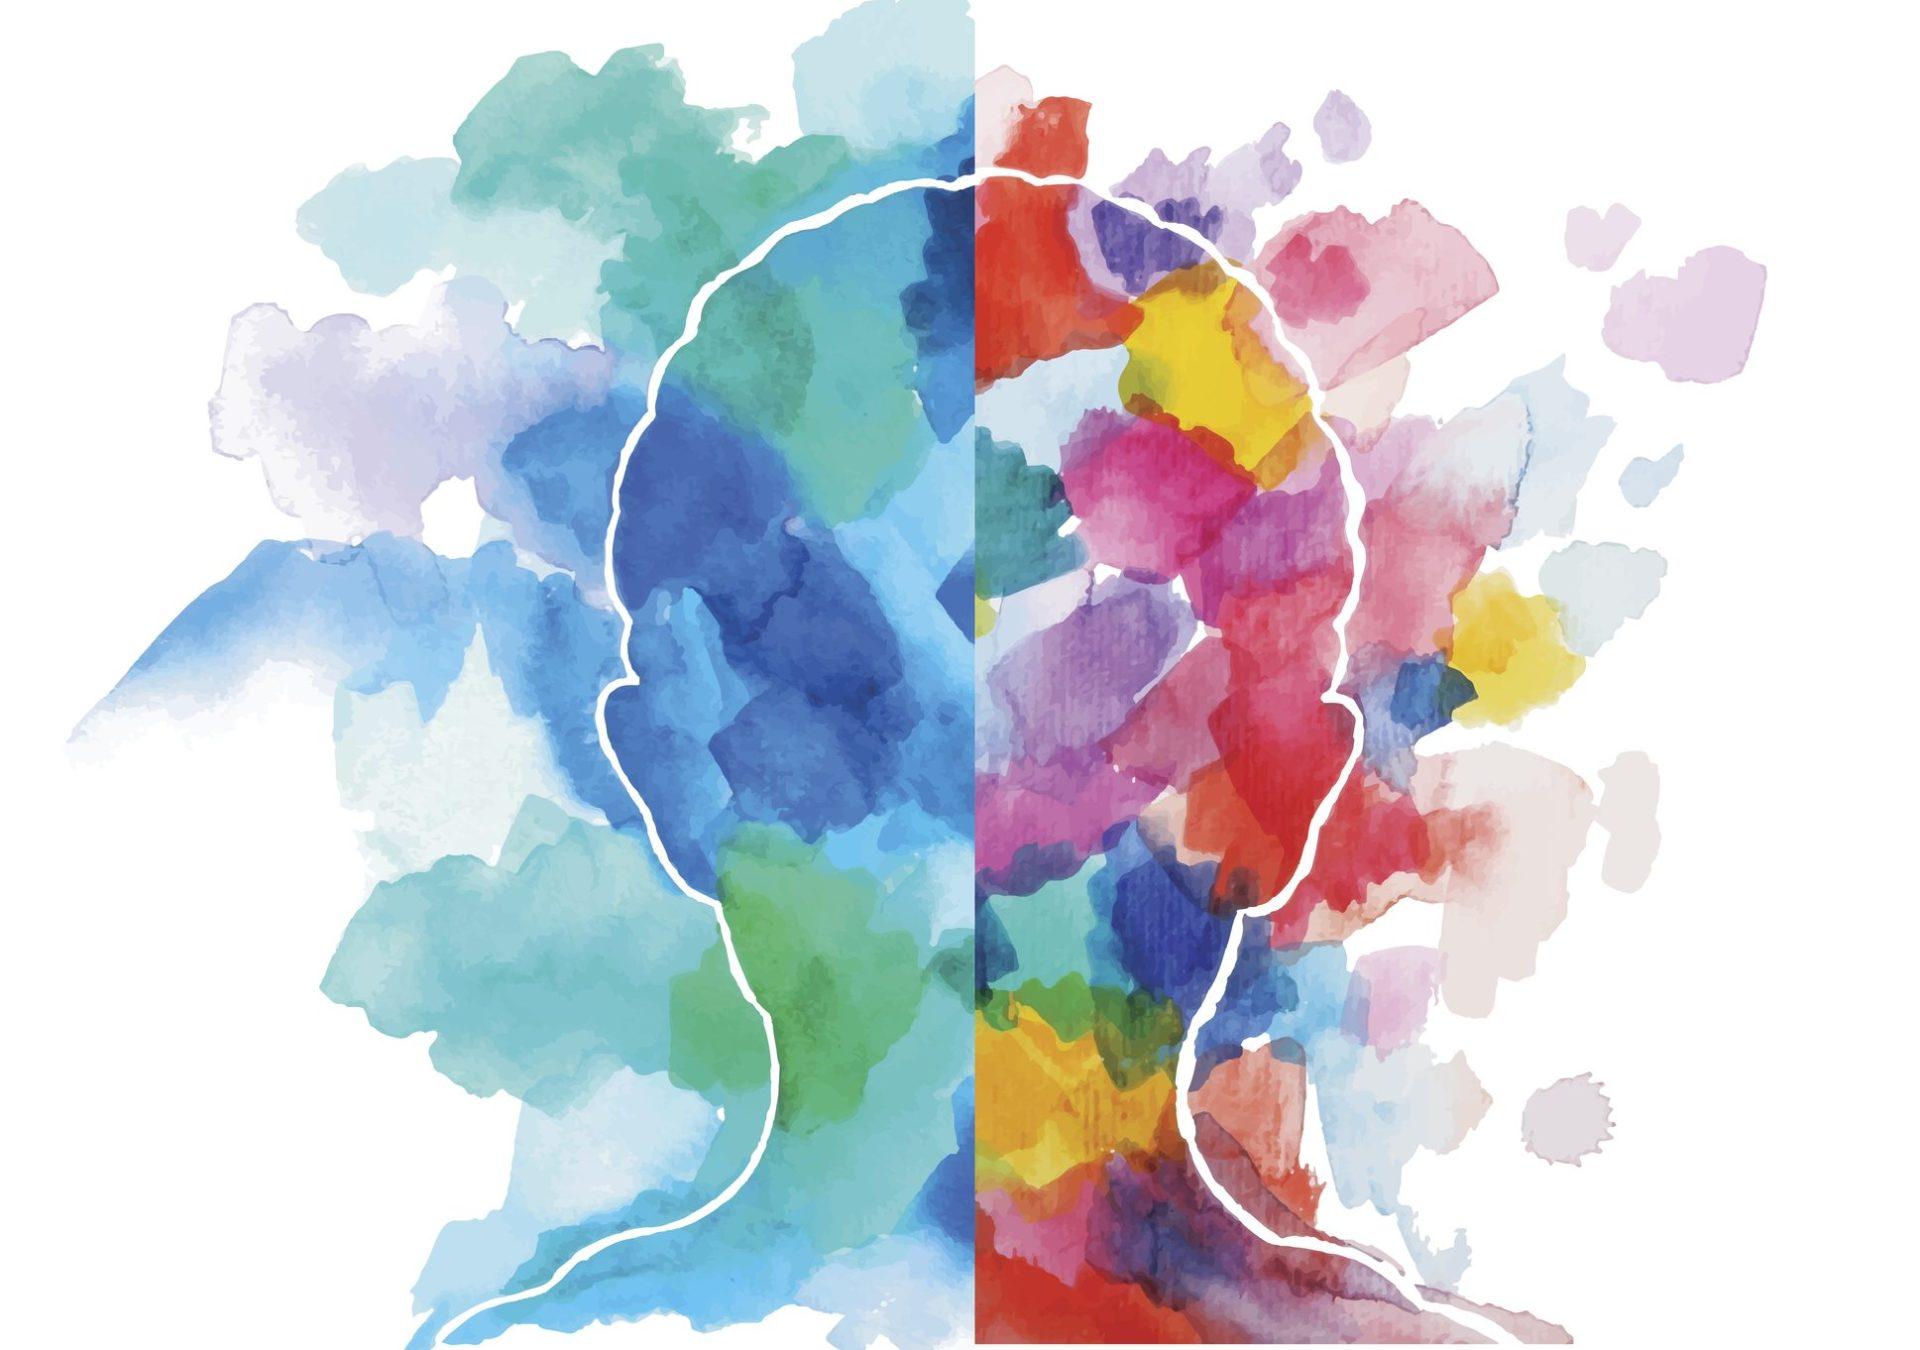 Mediazione, intelligenza emotiva, assenza di conflitto